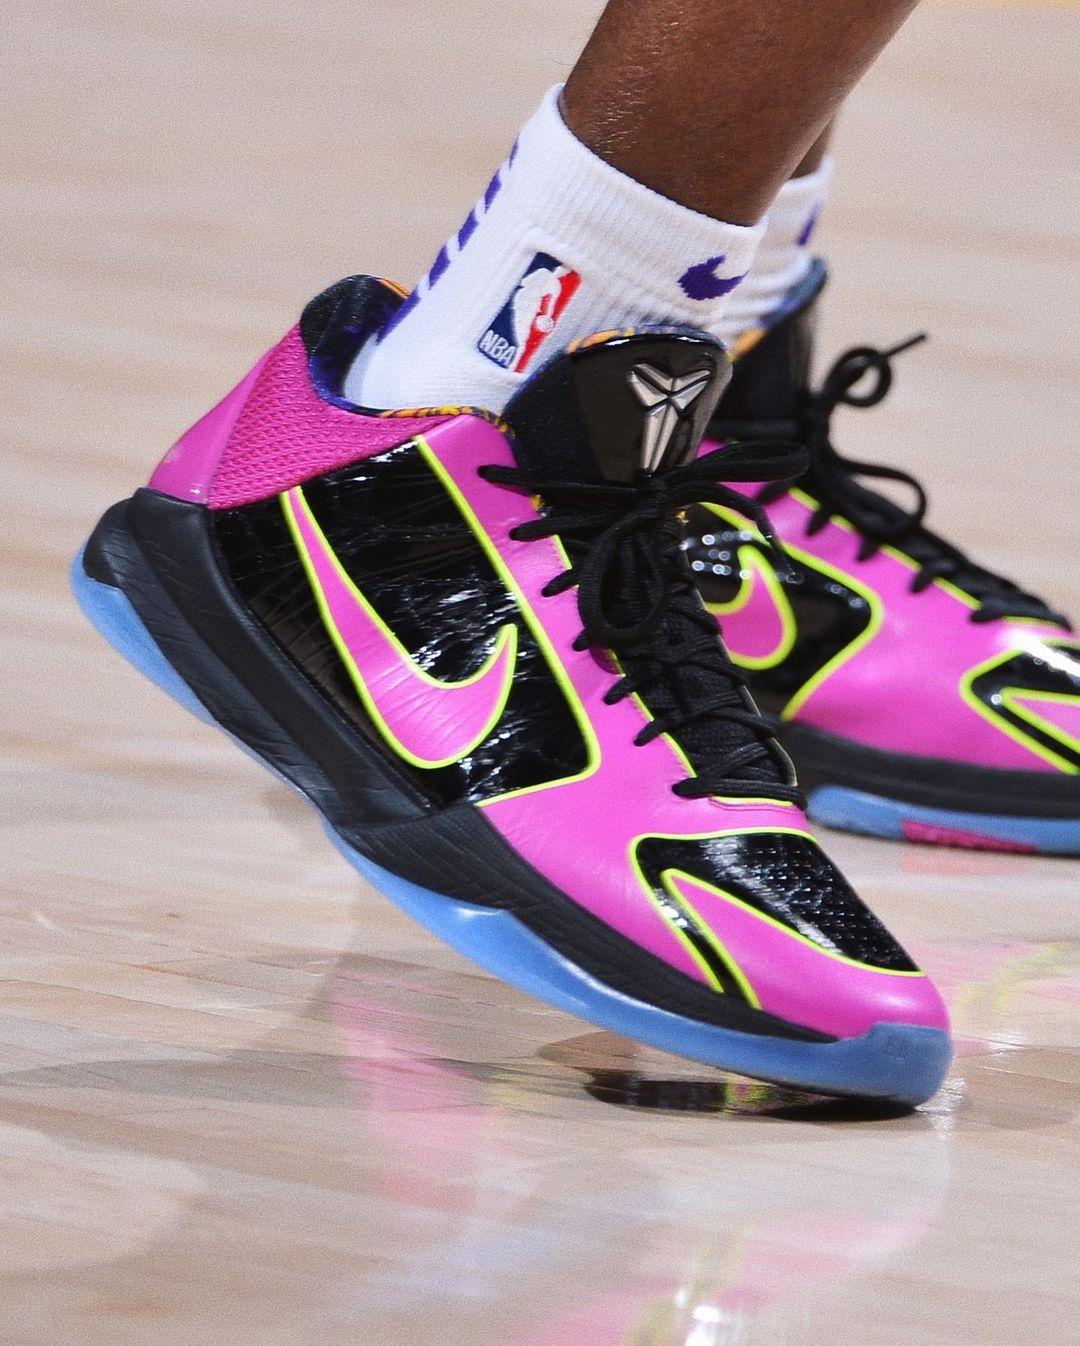 NBA,LeBron 18,Kobe 5 Protro,Ai  近日 NBA 球鞋上脚!科比战靴仍是赛场主角!